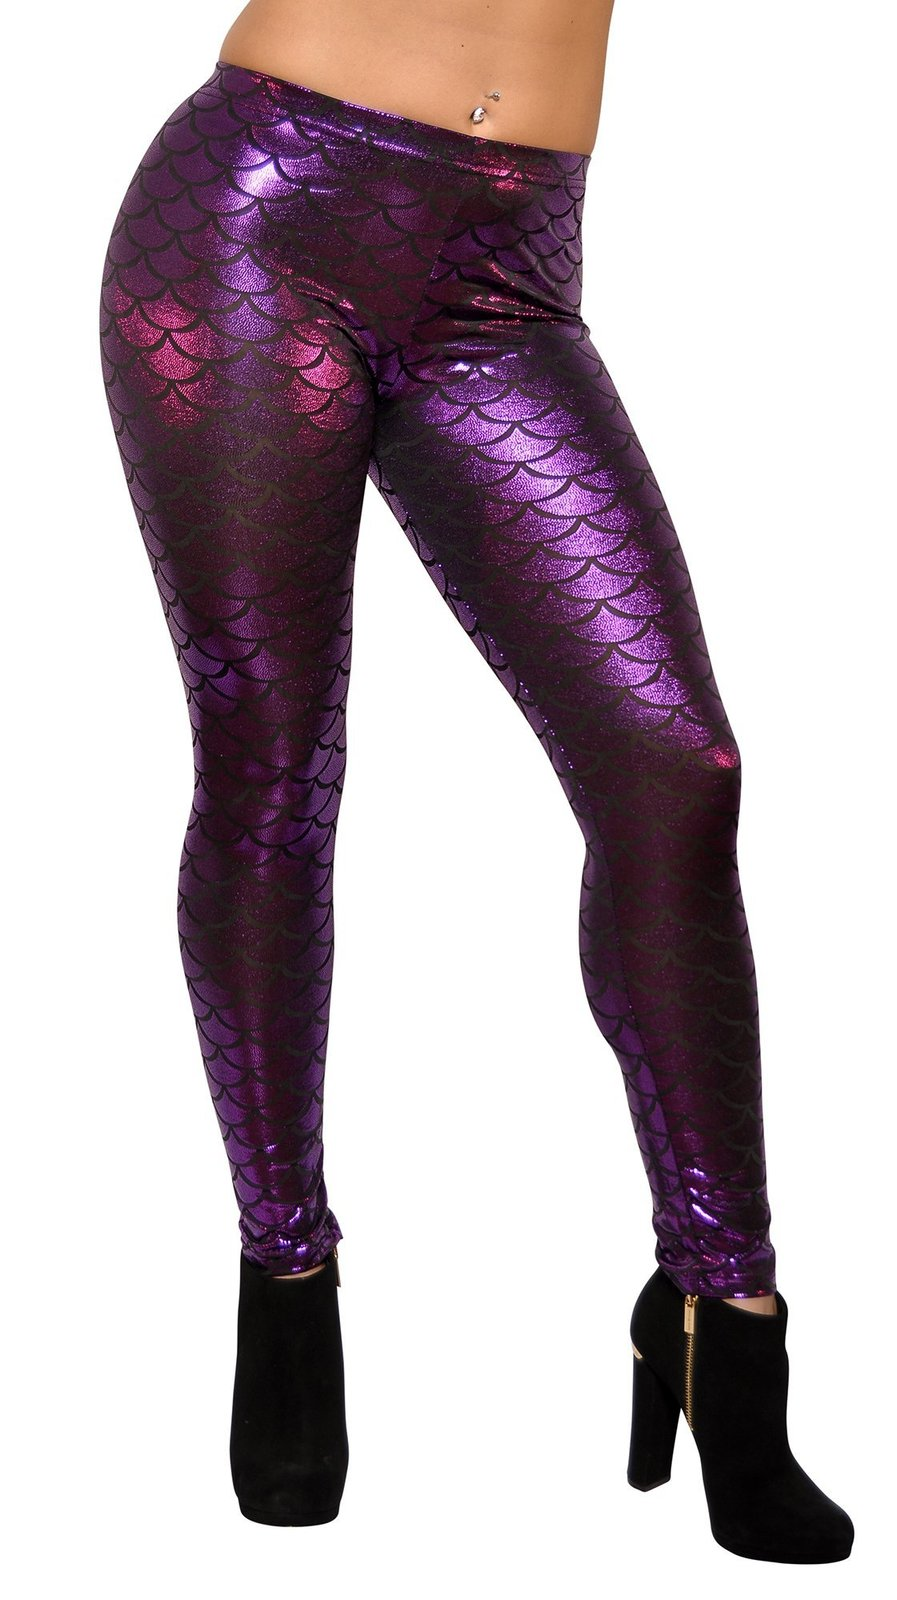 7a7ae9b6bfbbf BadAssLeggings Women s Mermaid Leggings and 28 similar items